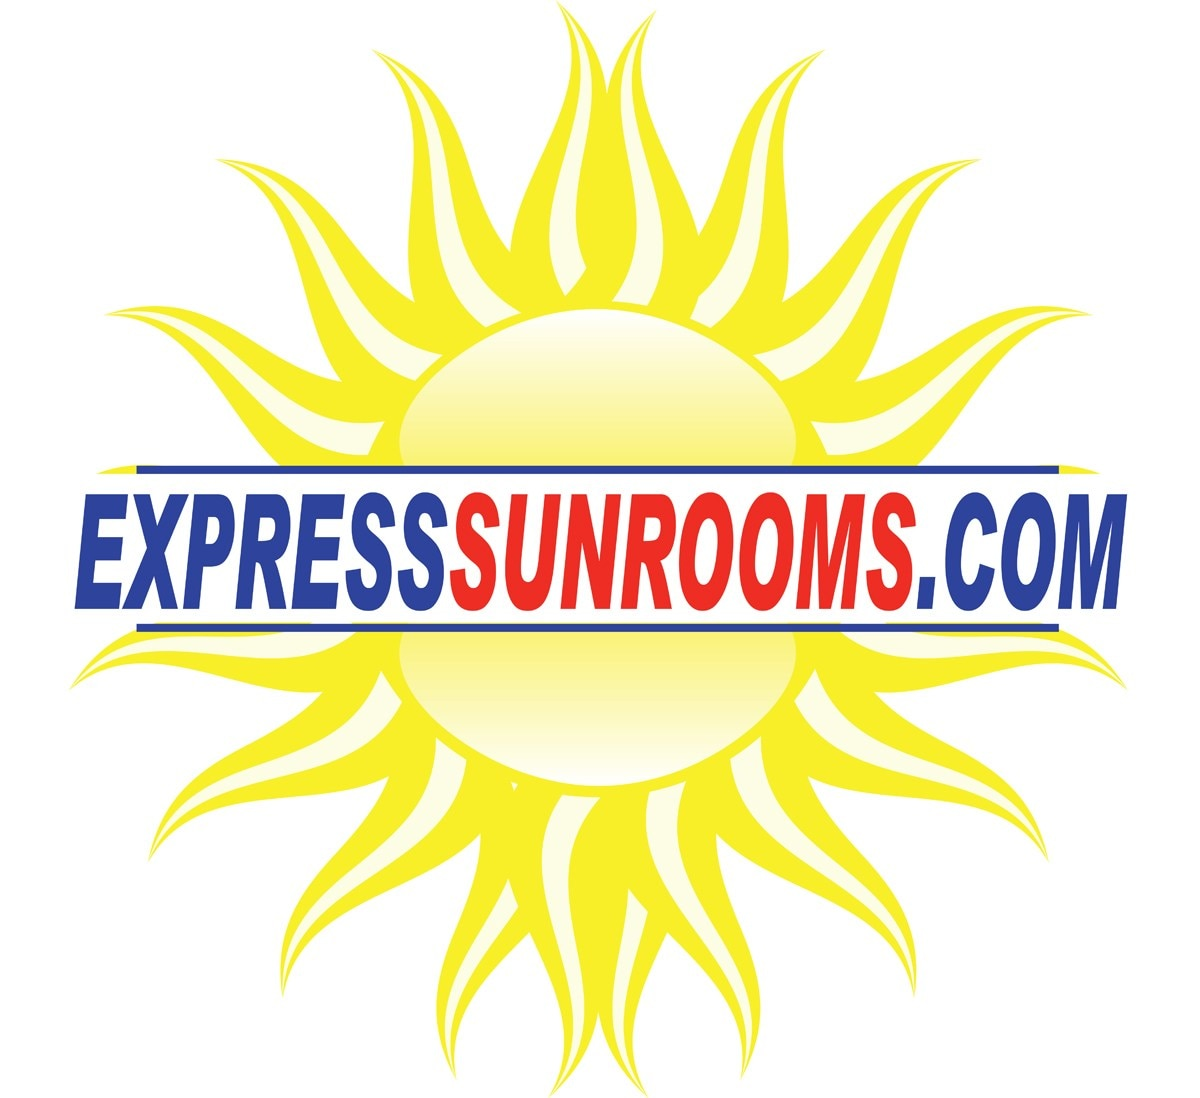 Express Sunrooms logo